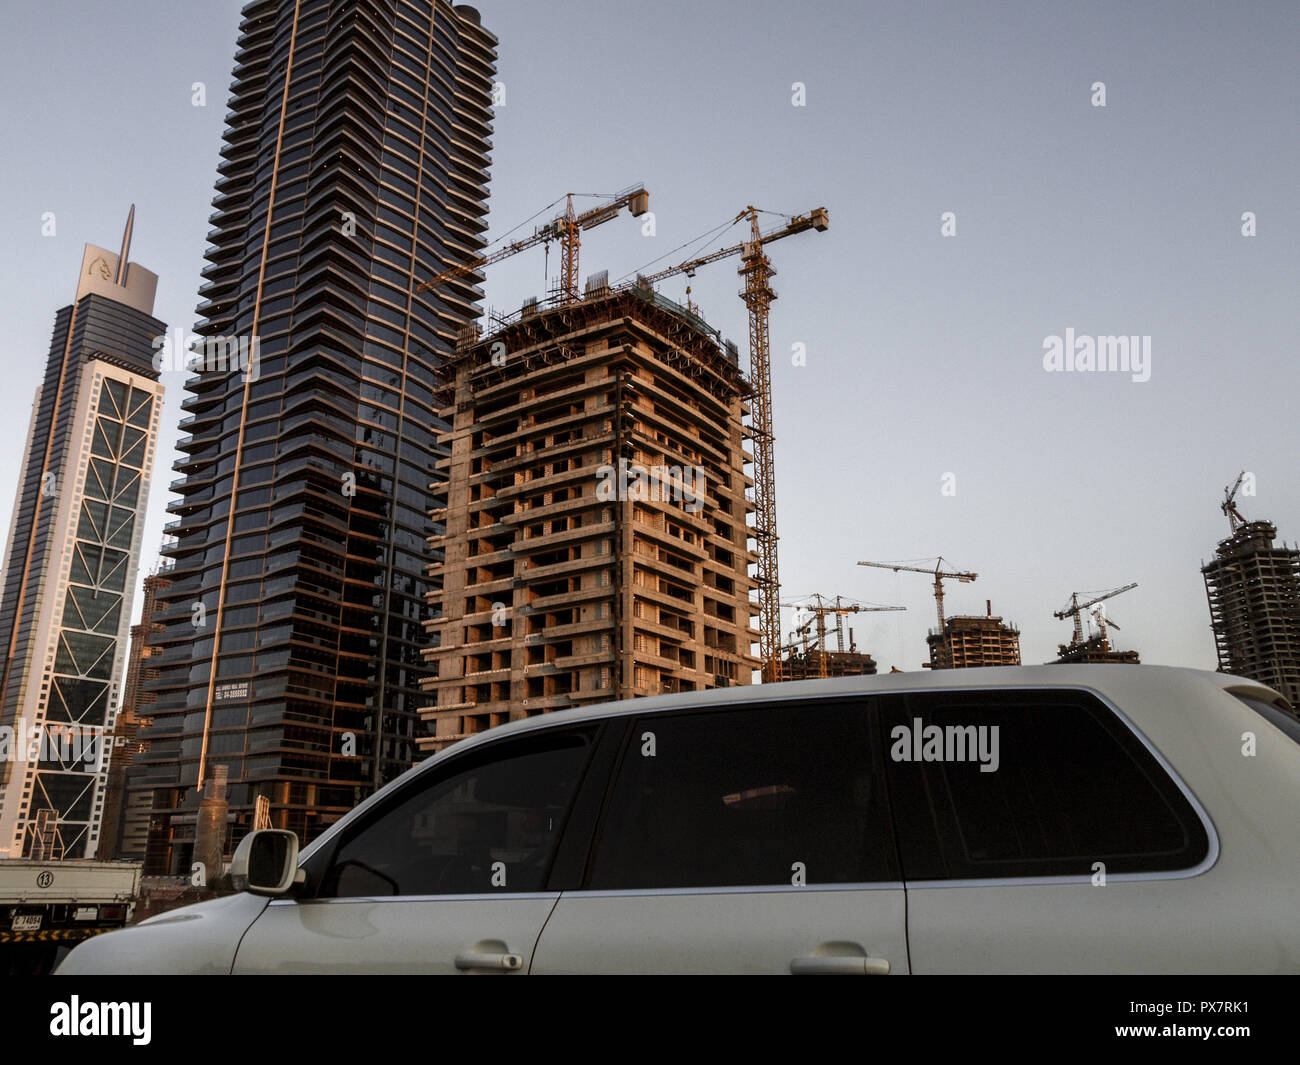 Dubai Dubai Limousine Stock Photos & Dubai Dubai Limousine